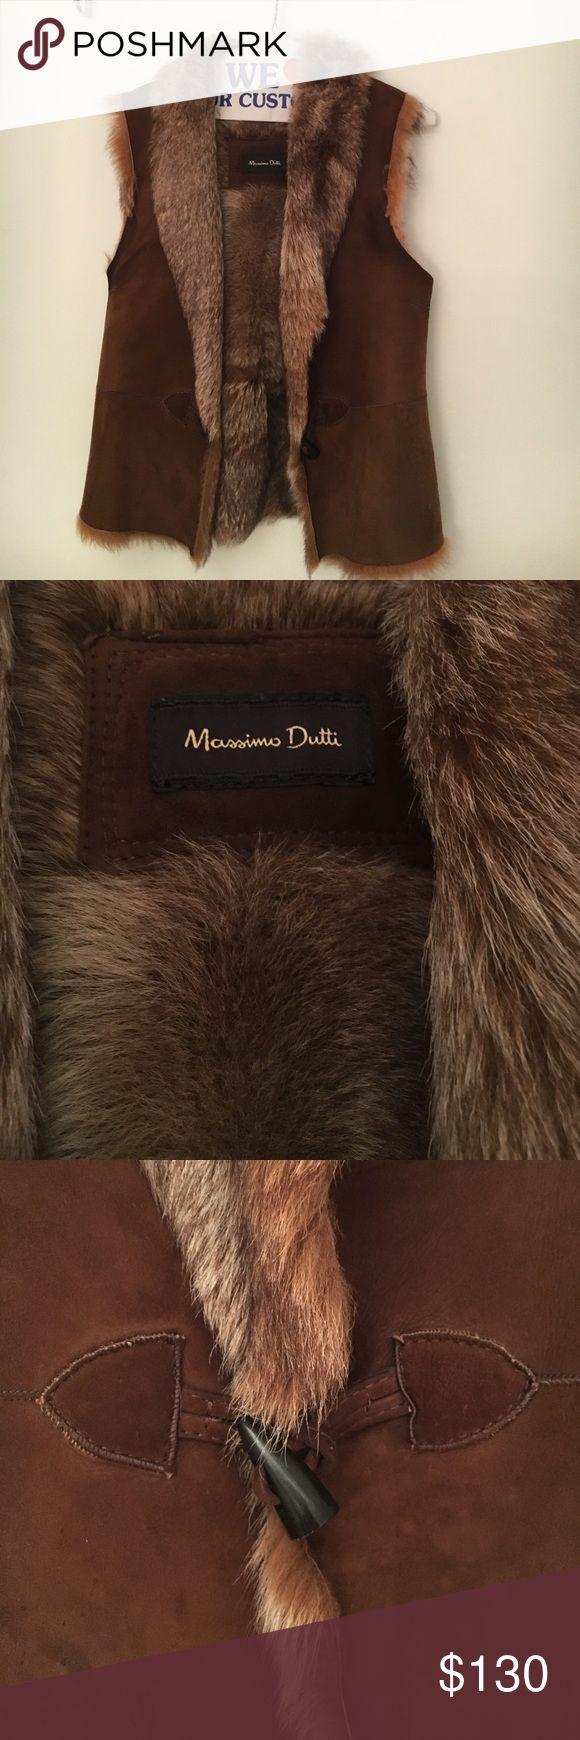 Brown fur vest. Sheep skin. Sz M. Massimo Dutti Brown fur vest. Sheep skin. Sz M. Massimo Dutti. Good condition. Massimo Dutti Jackets & Coats Vests